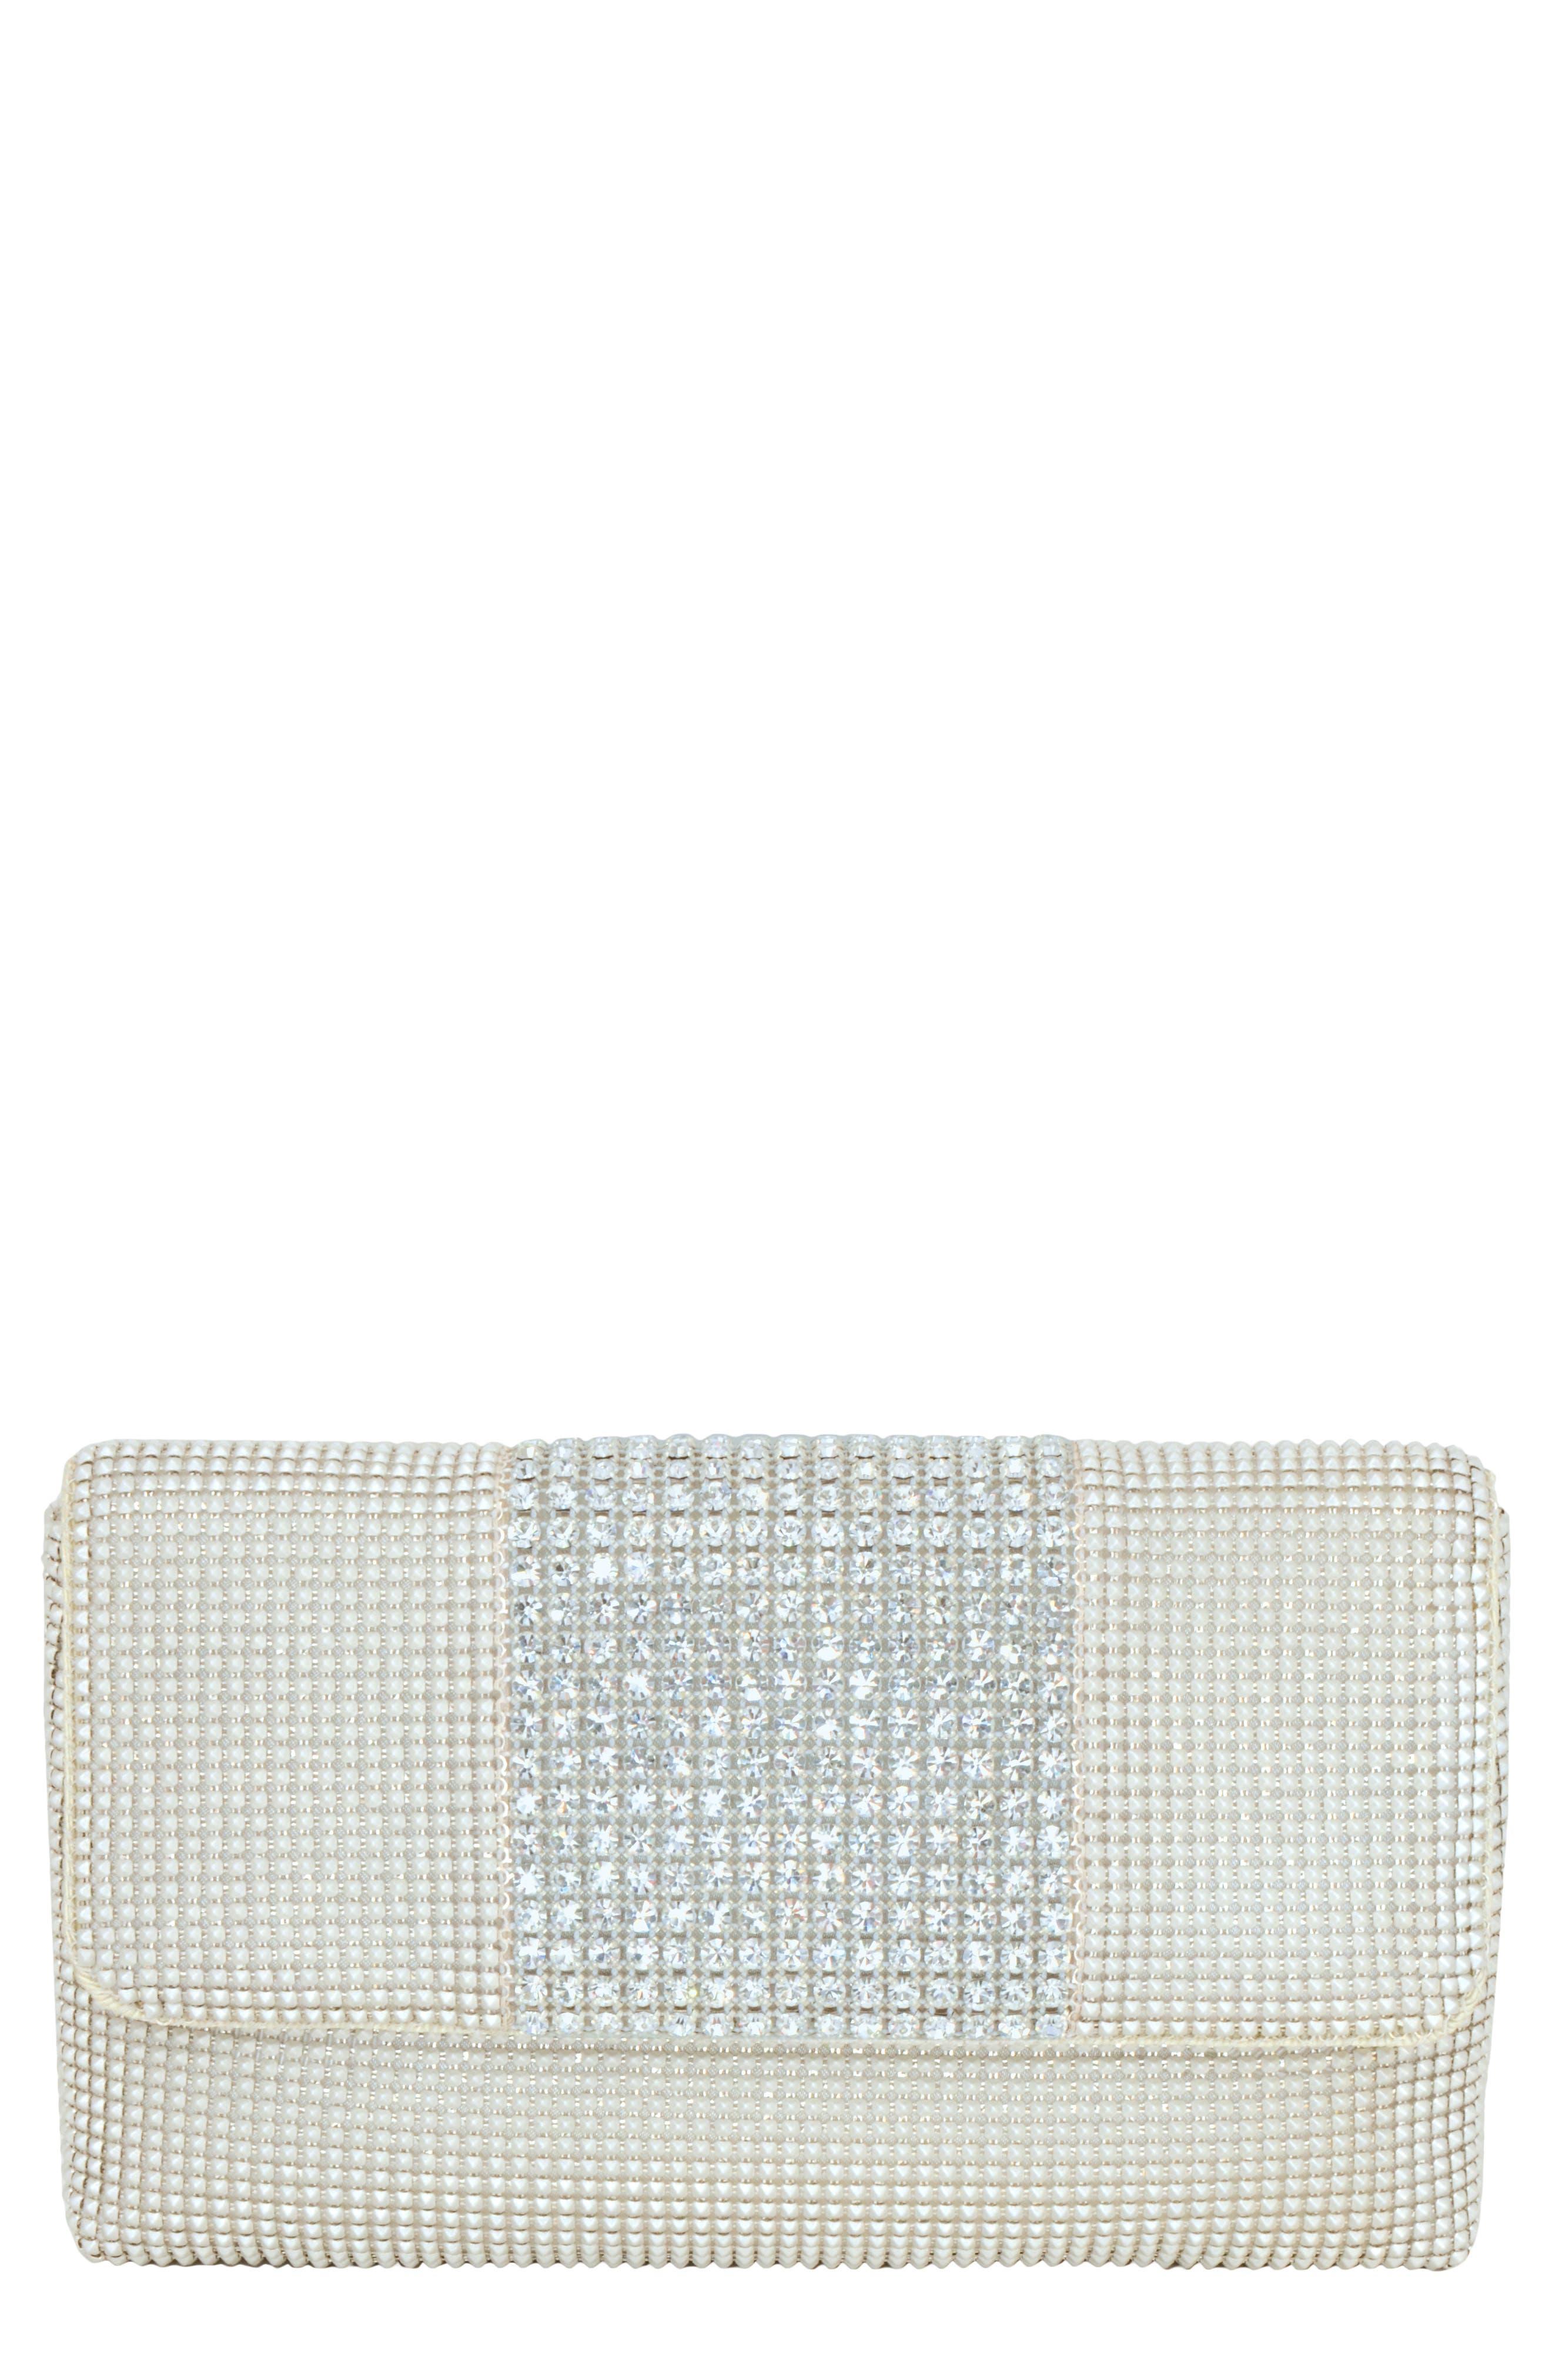 WHITING & DAVIS Rhinestone Stripe Metallic Mesh Flap Clutch - Ivory in Pearl